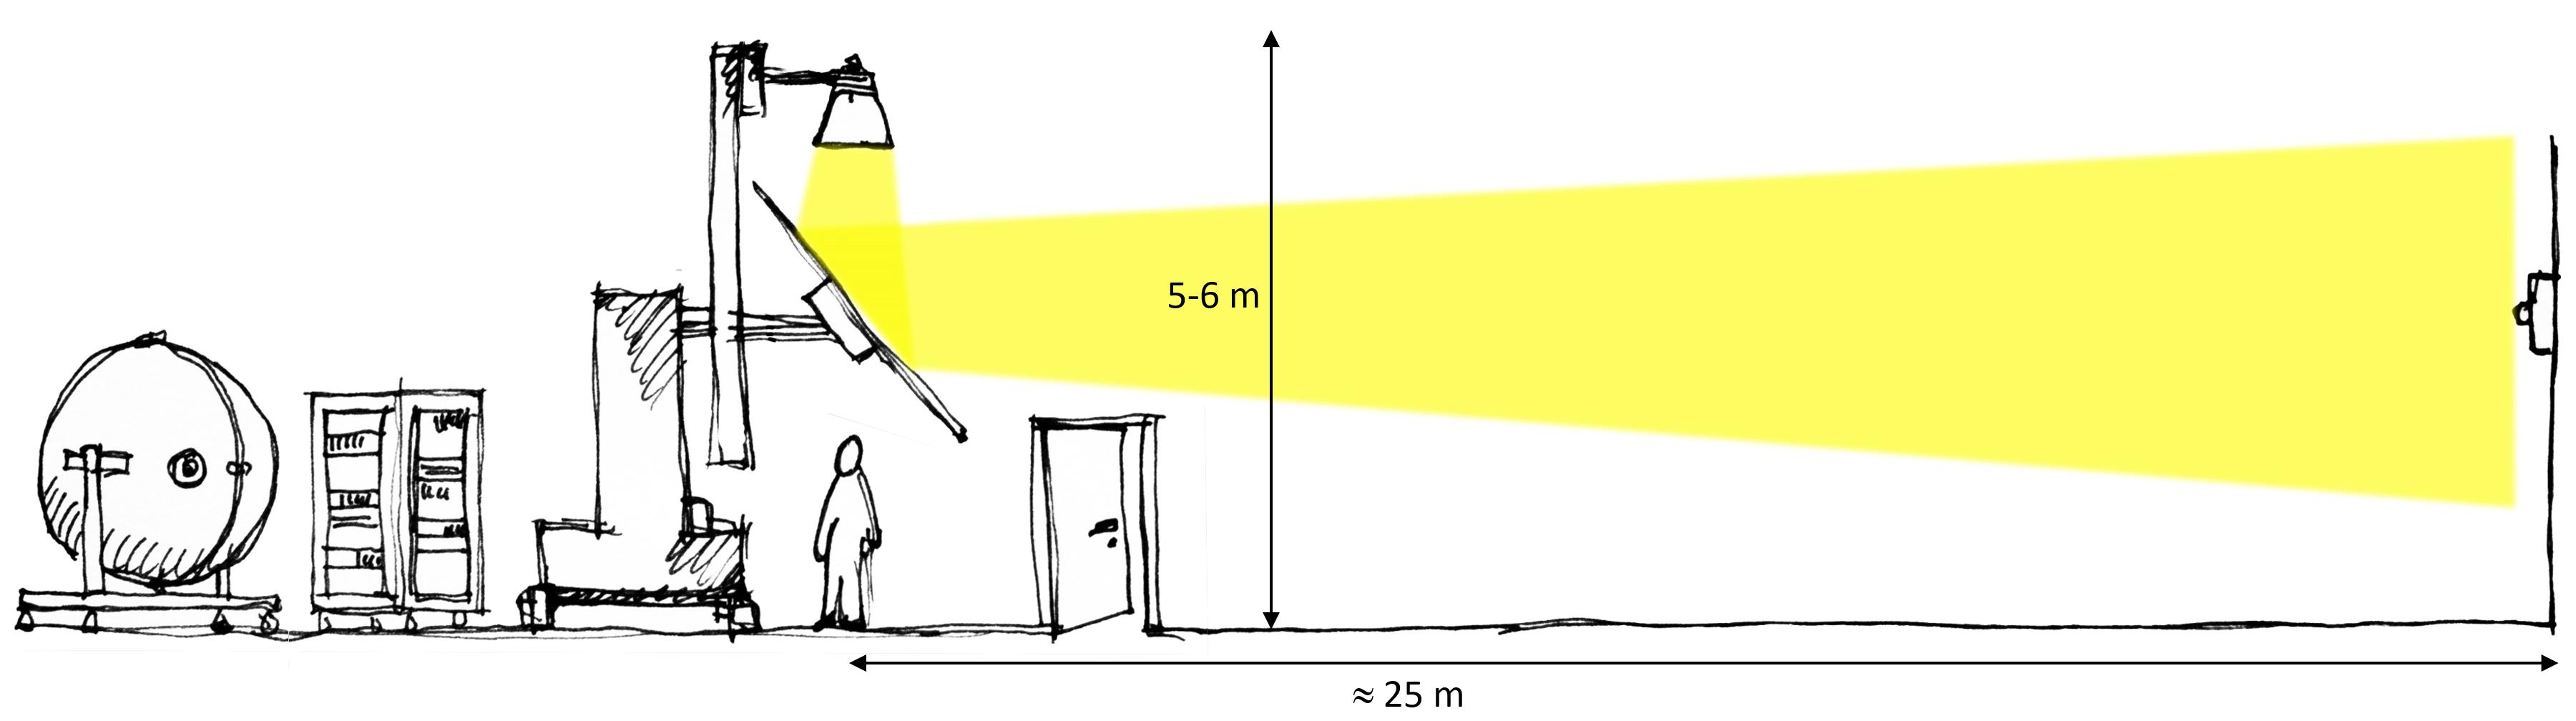 integrating sphere and goniometer light measurement lab